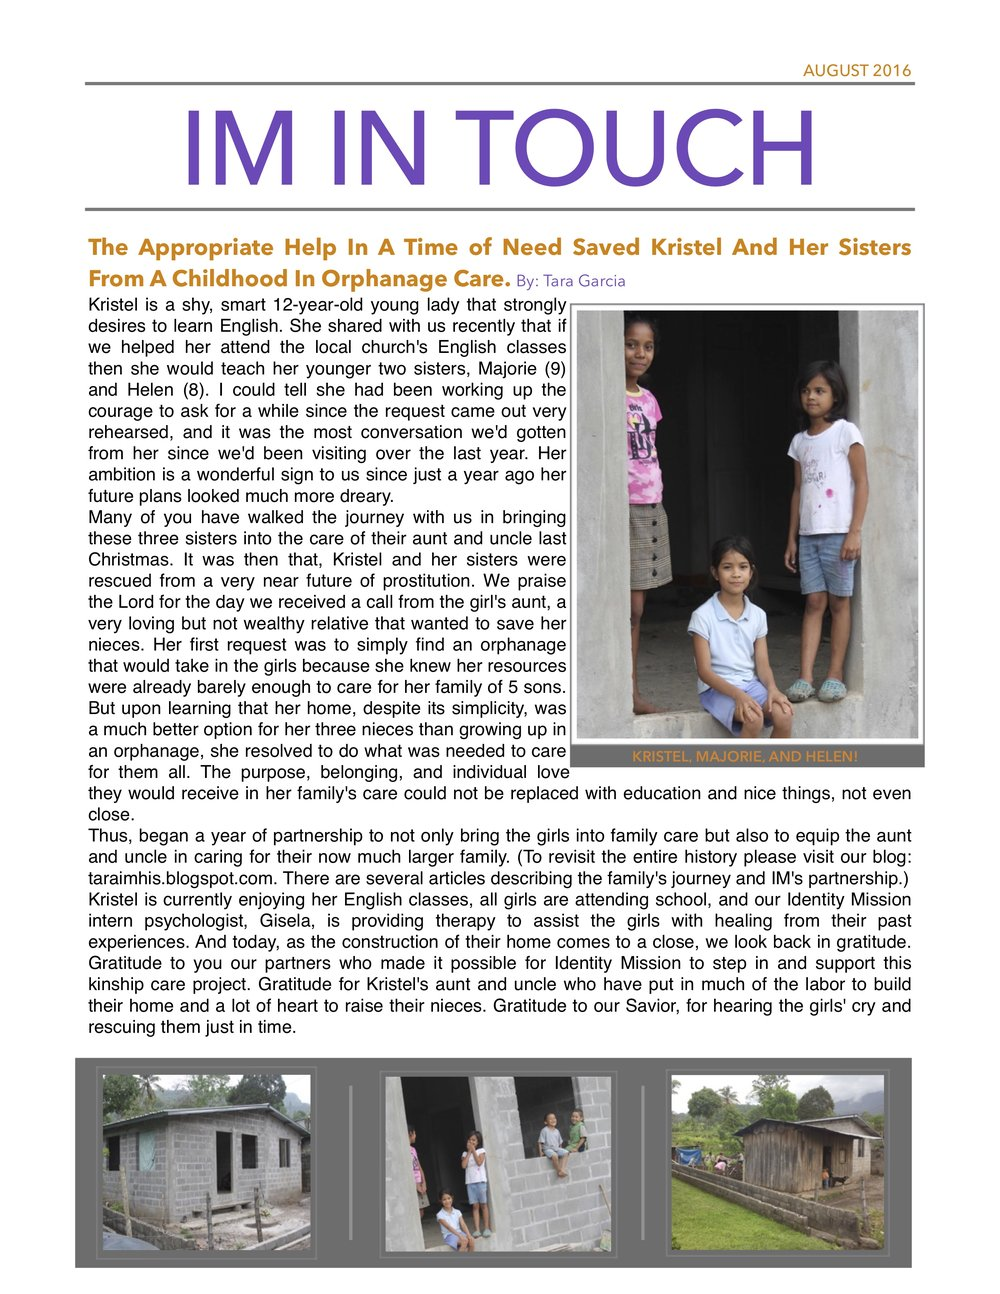 IM Newsletter August copy.jpg